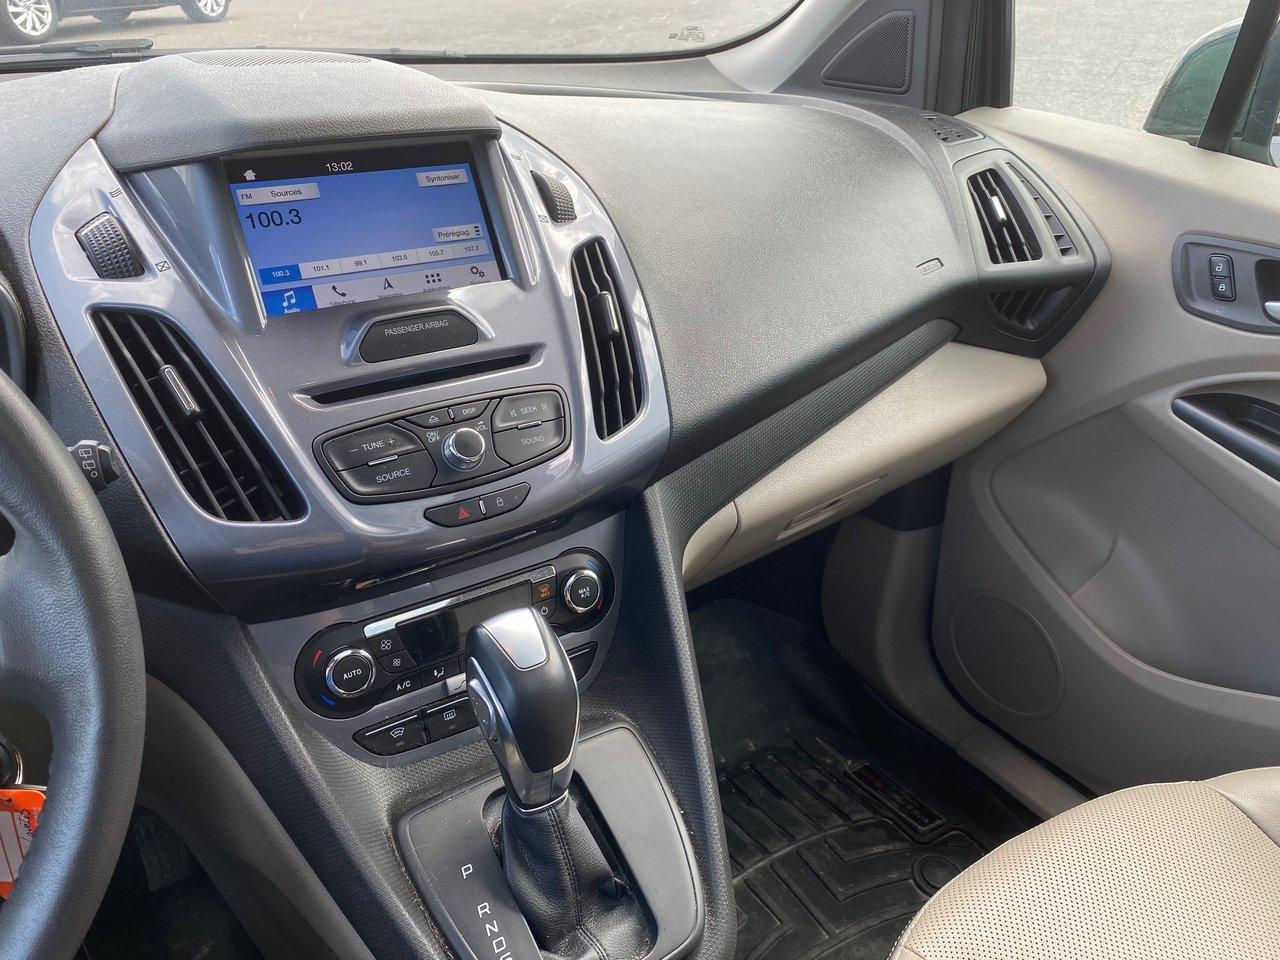 2018 Ford Transit Connect wagon Titanium